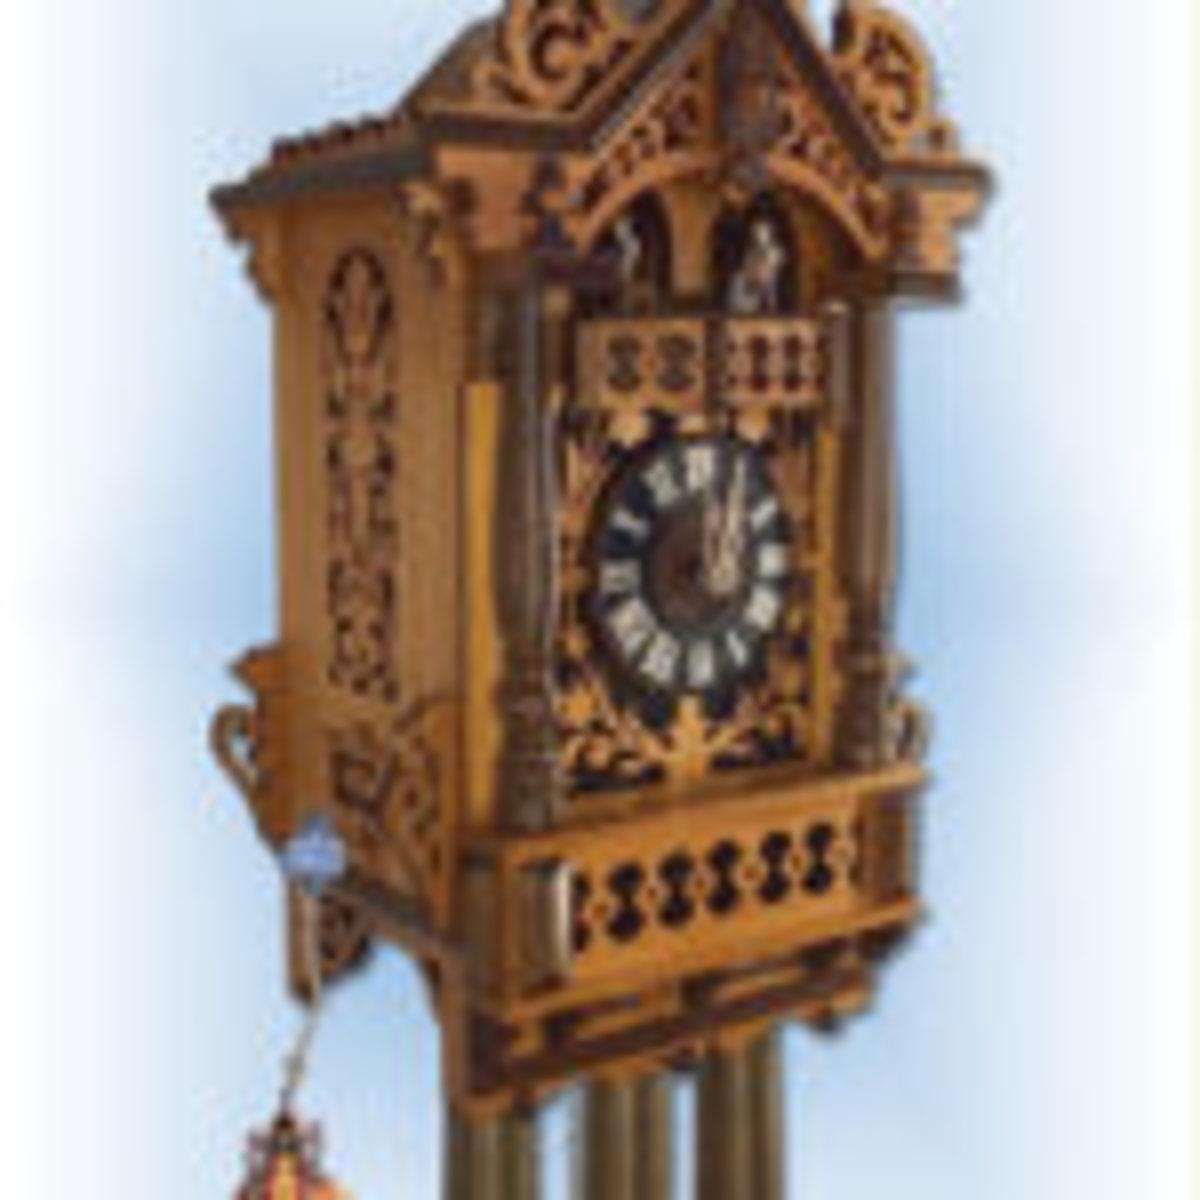 Trackwalker House cuckoo clock